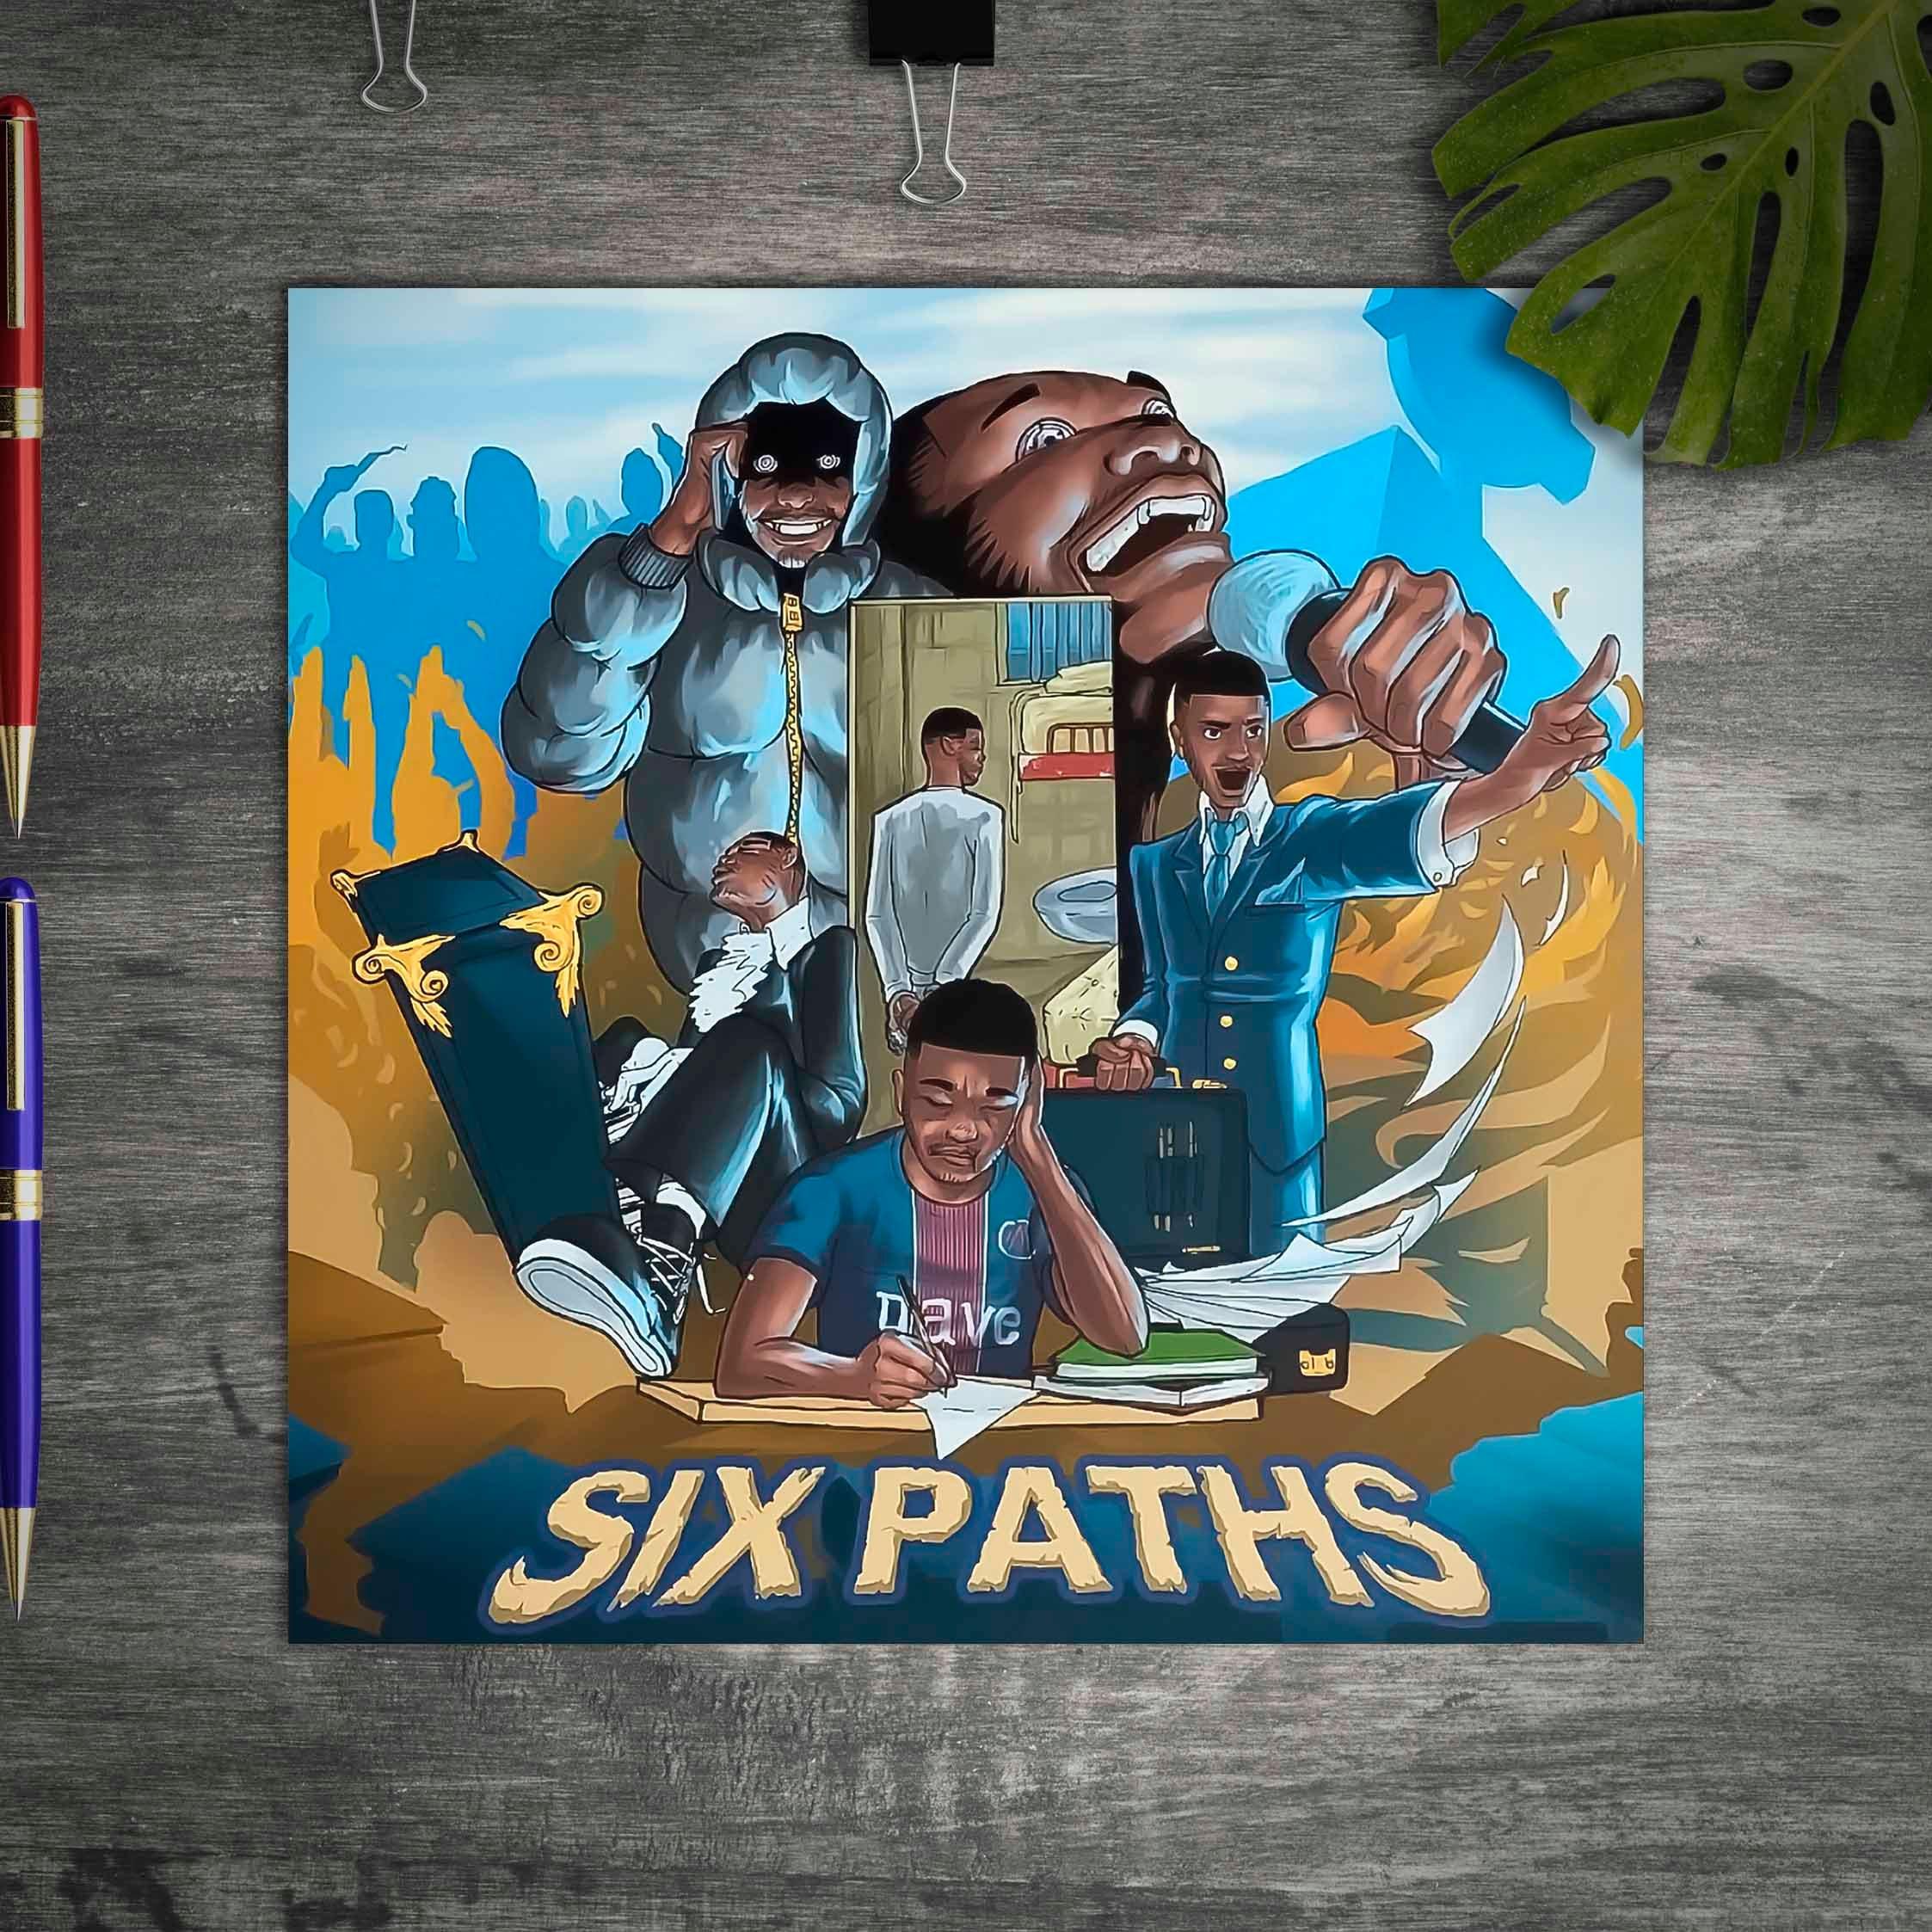 Dave Six Paths